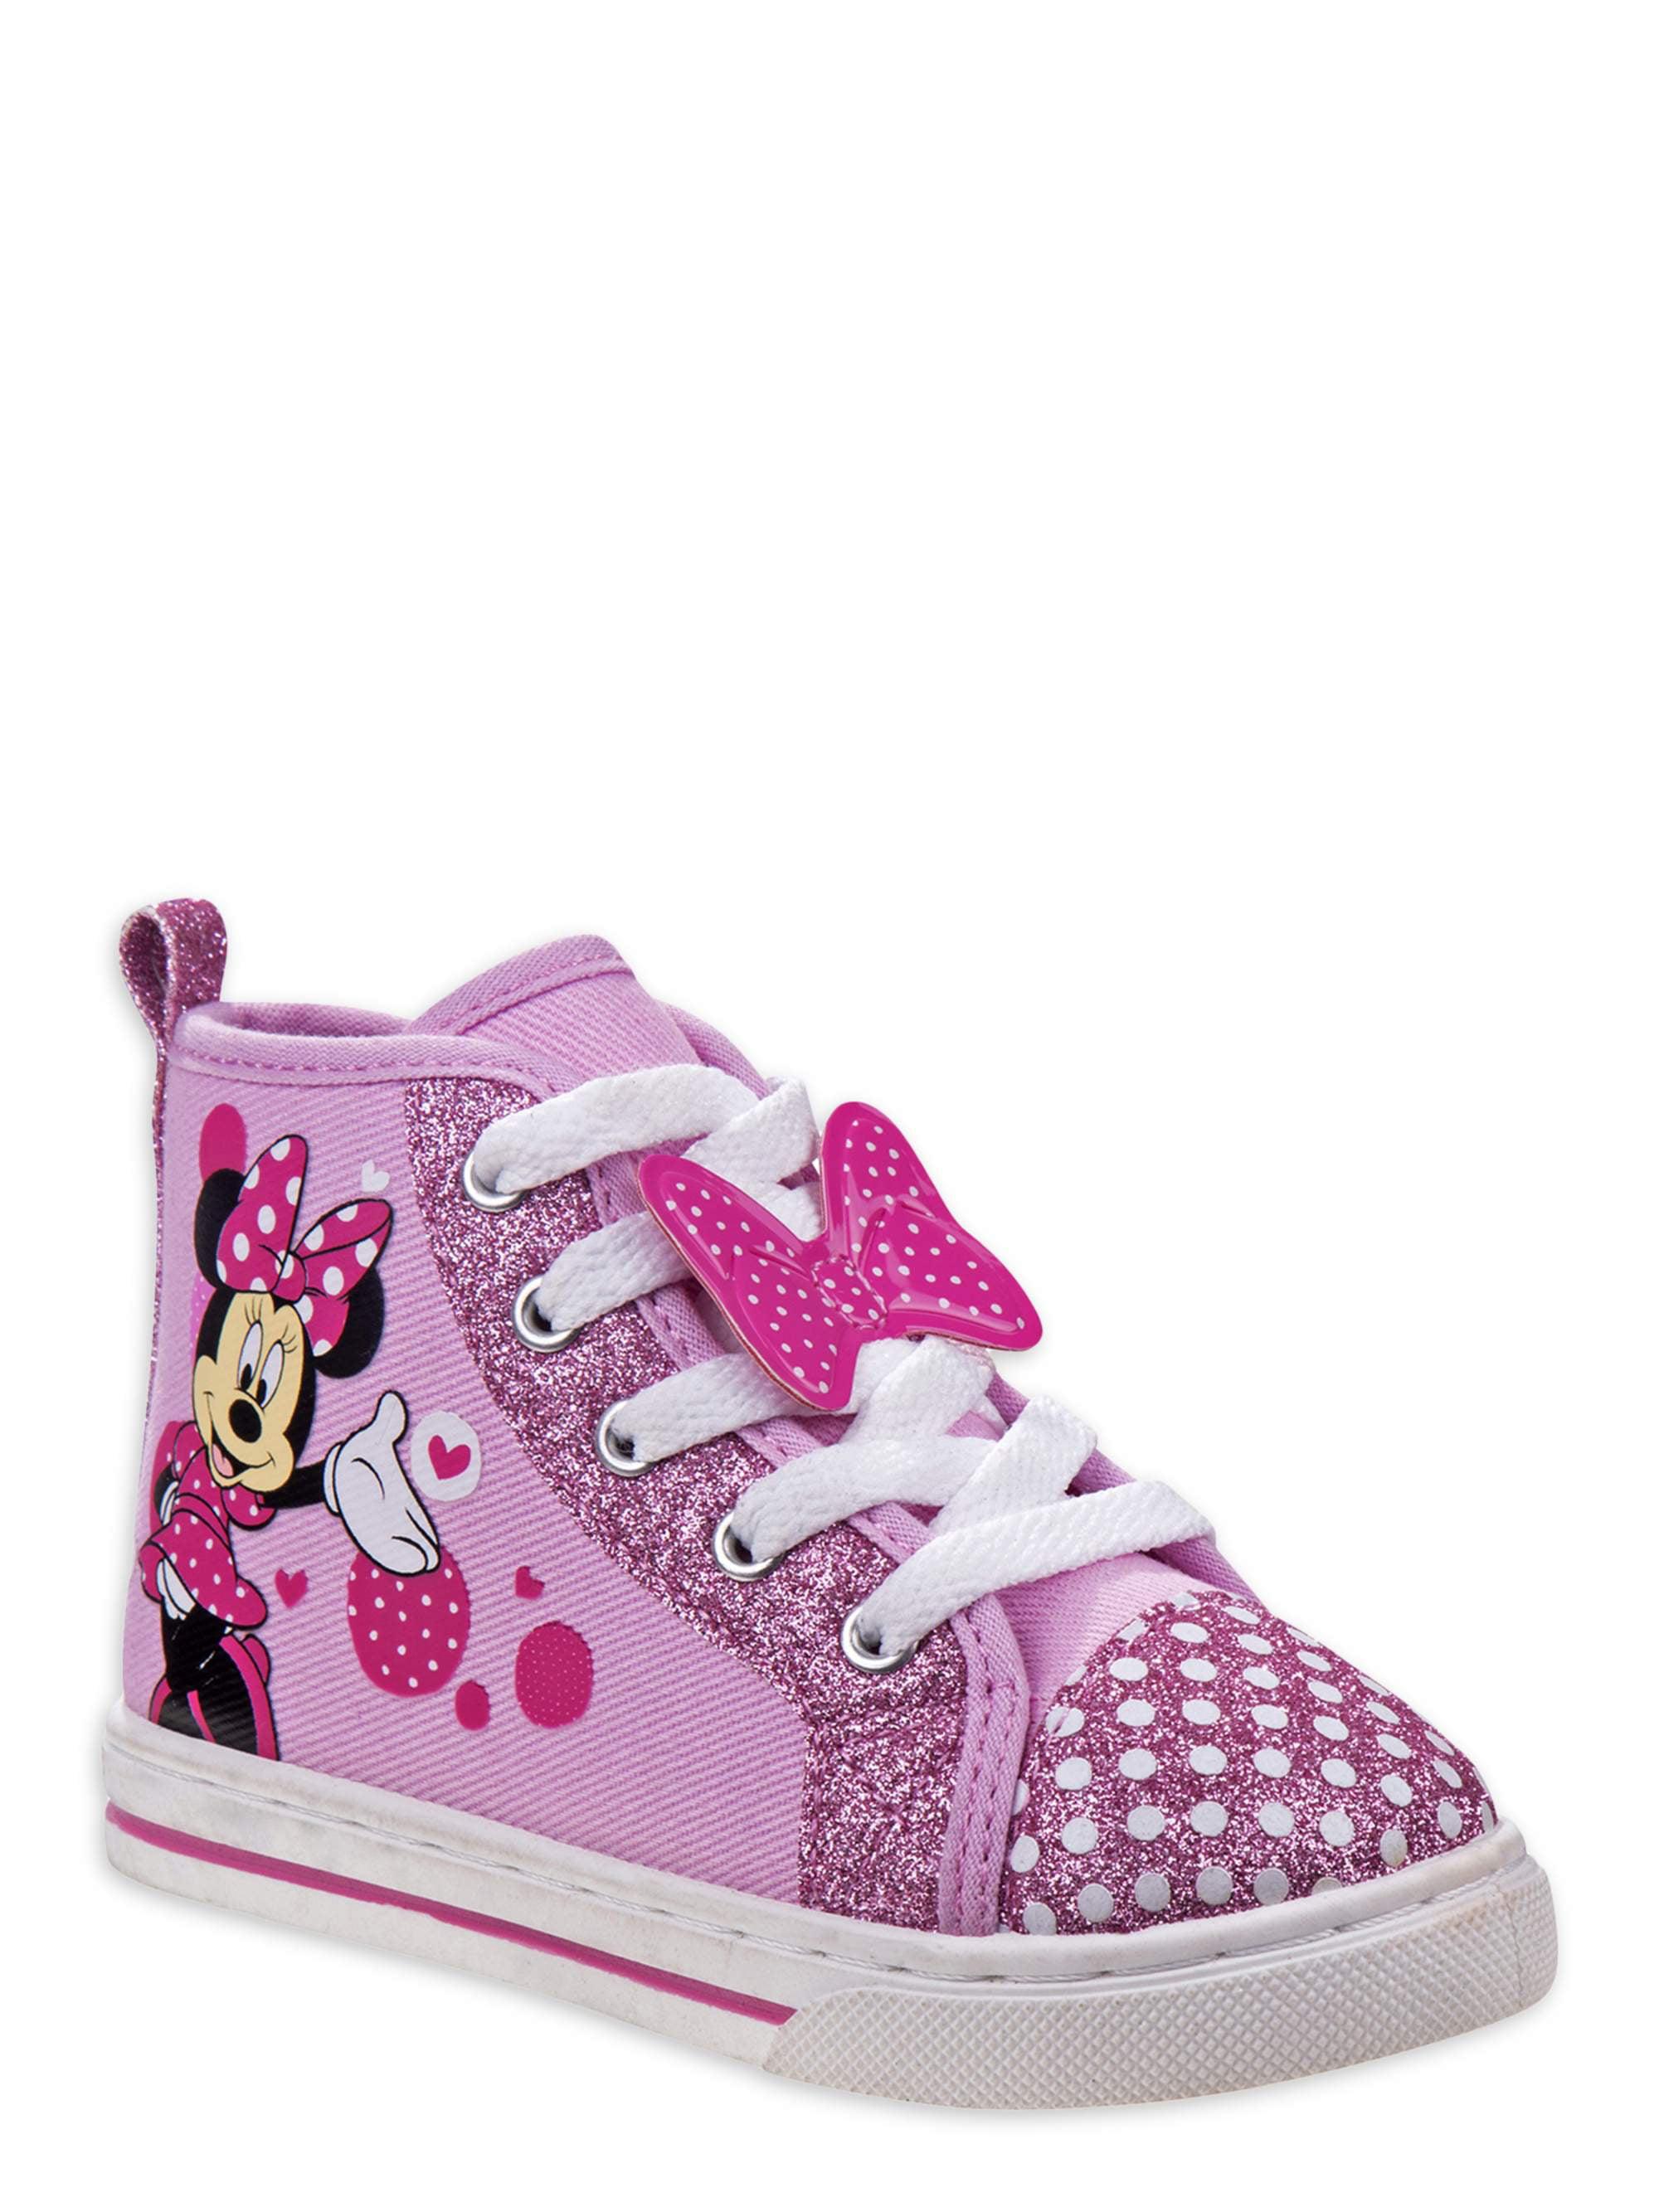 Disney Minnie Mouse Polka Dot Character